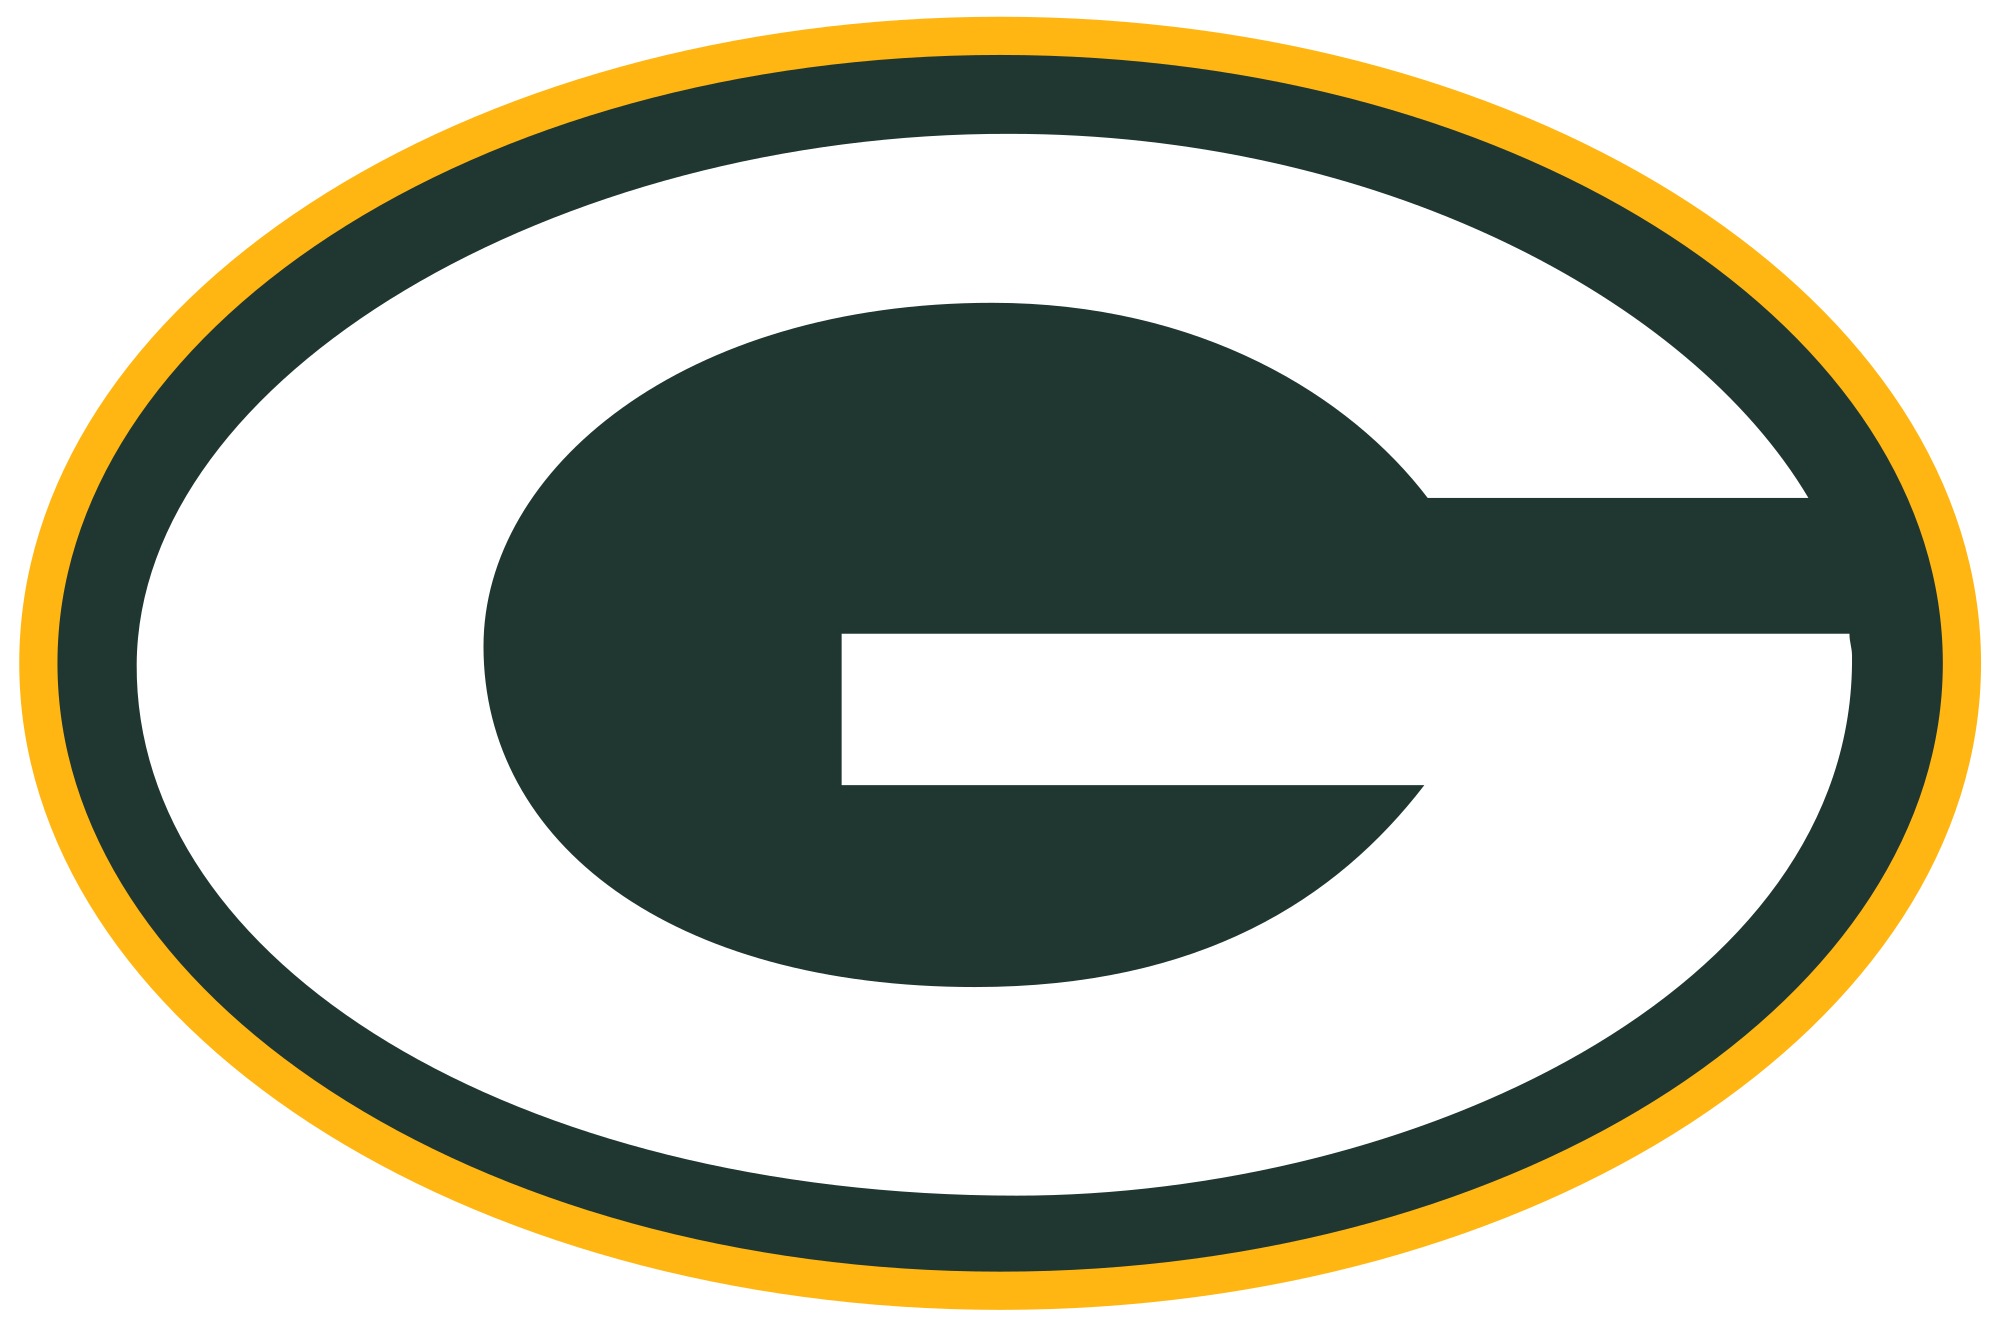 Green Bay Packers Logo Wallpaper Green bay packers logo